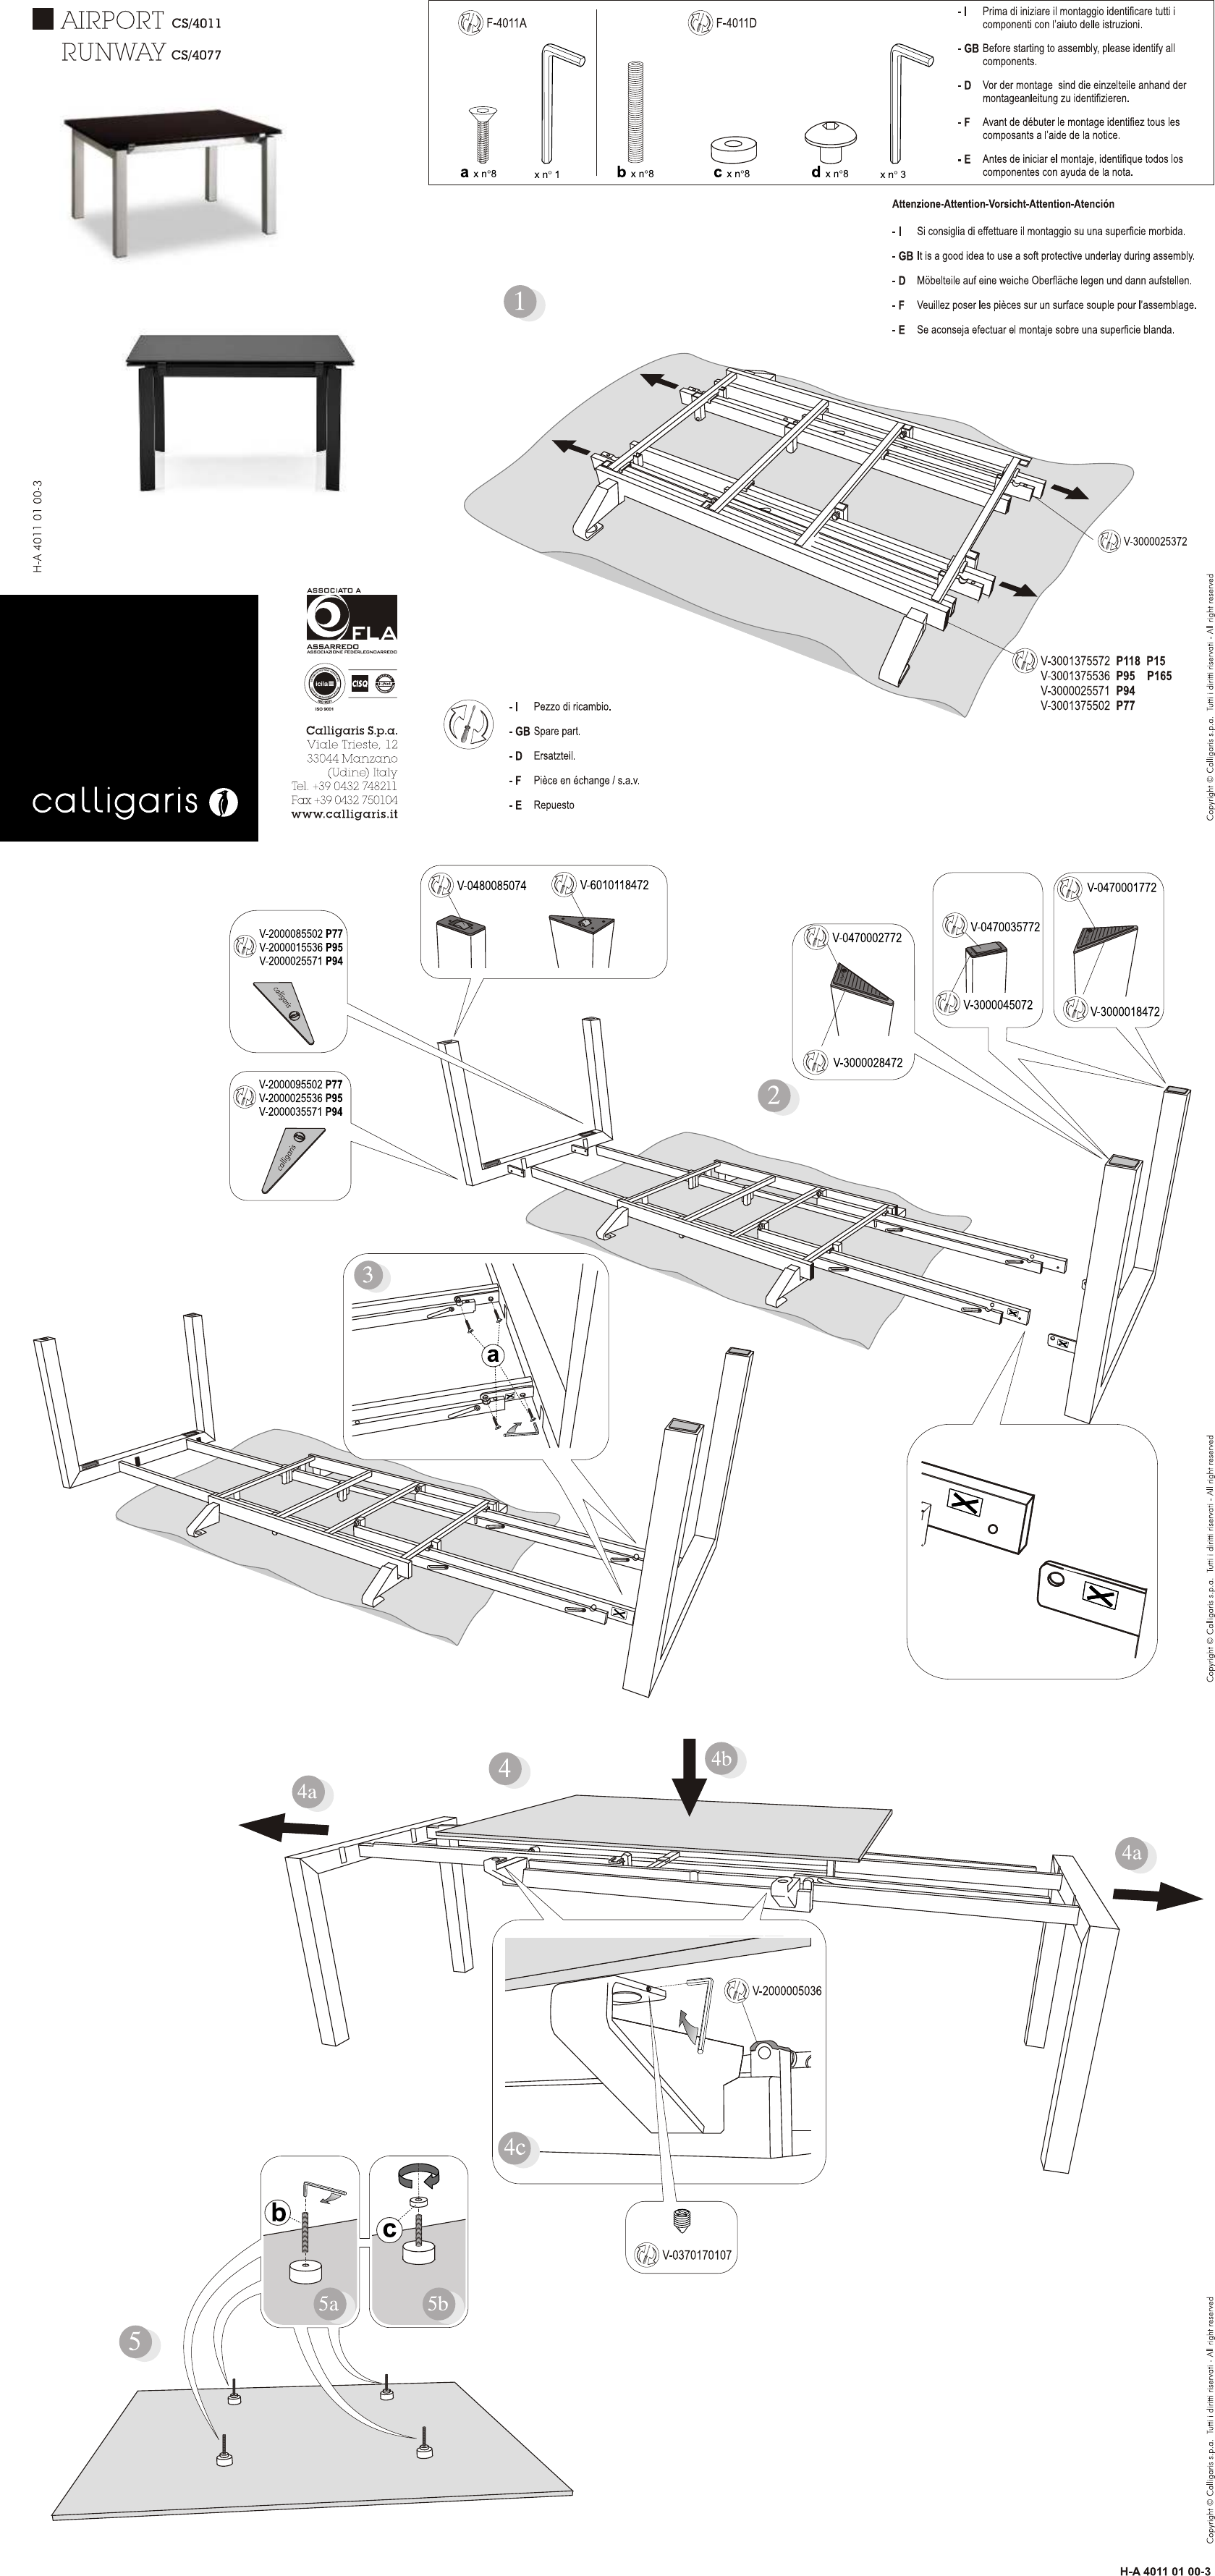 Airport One Calligaris.Calligaris Com Airport One Manual